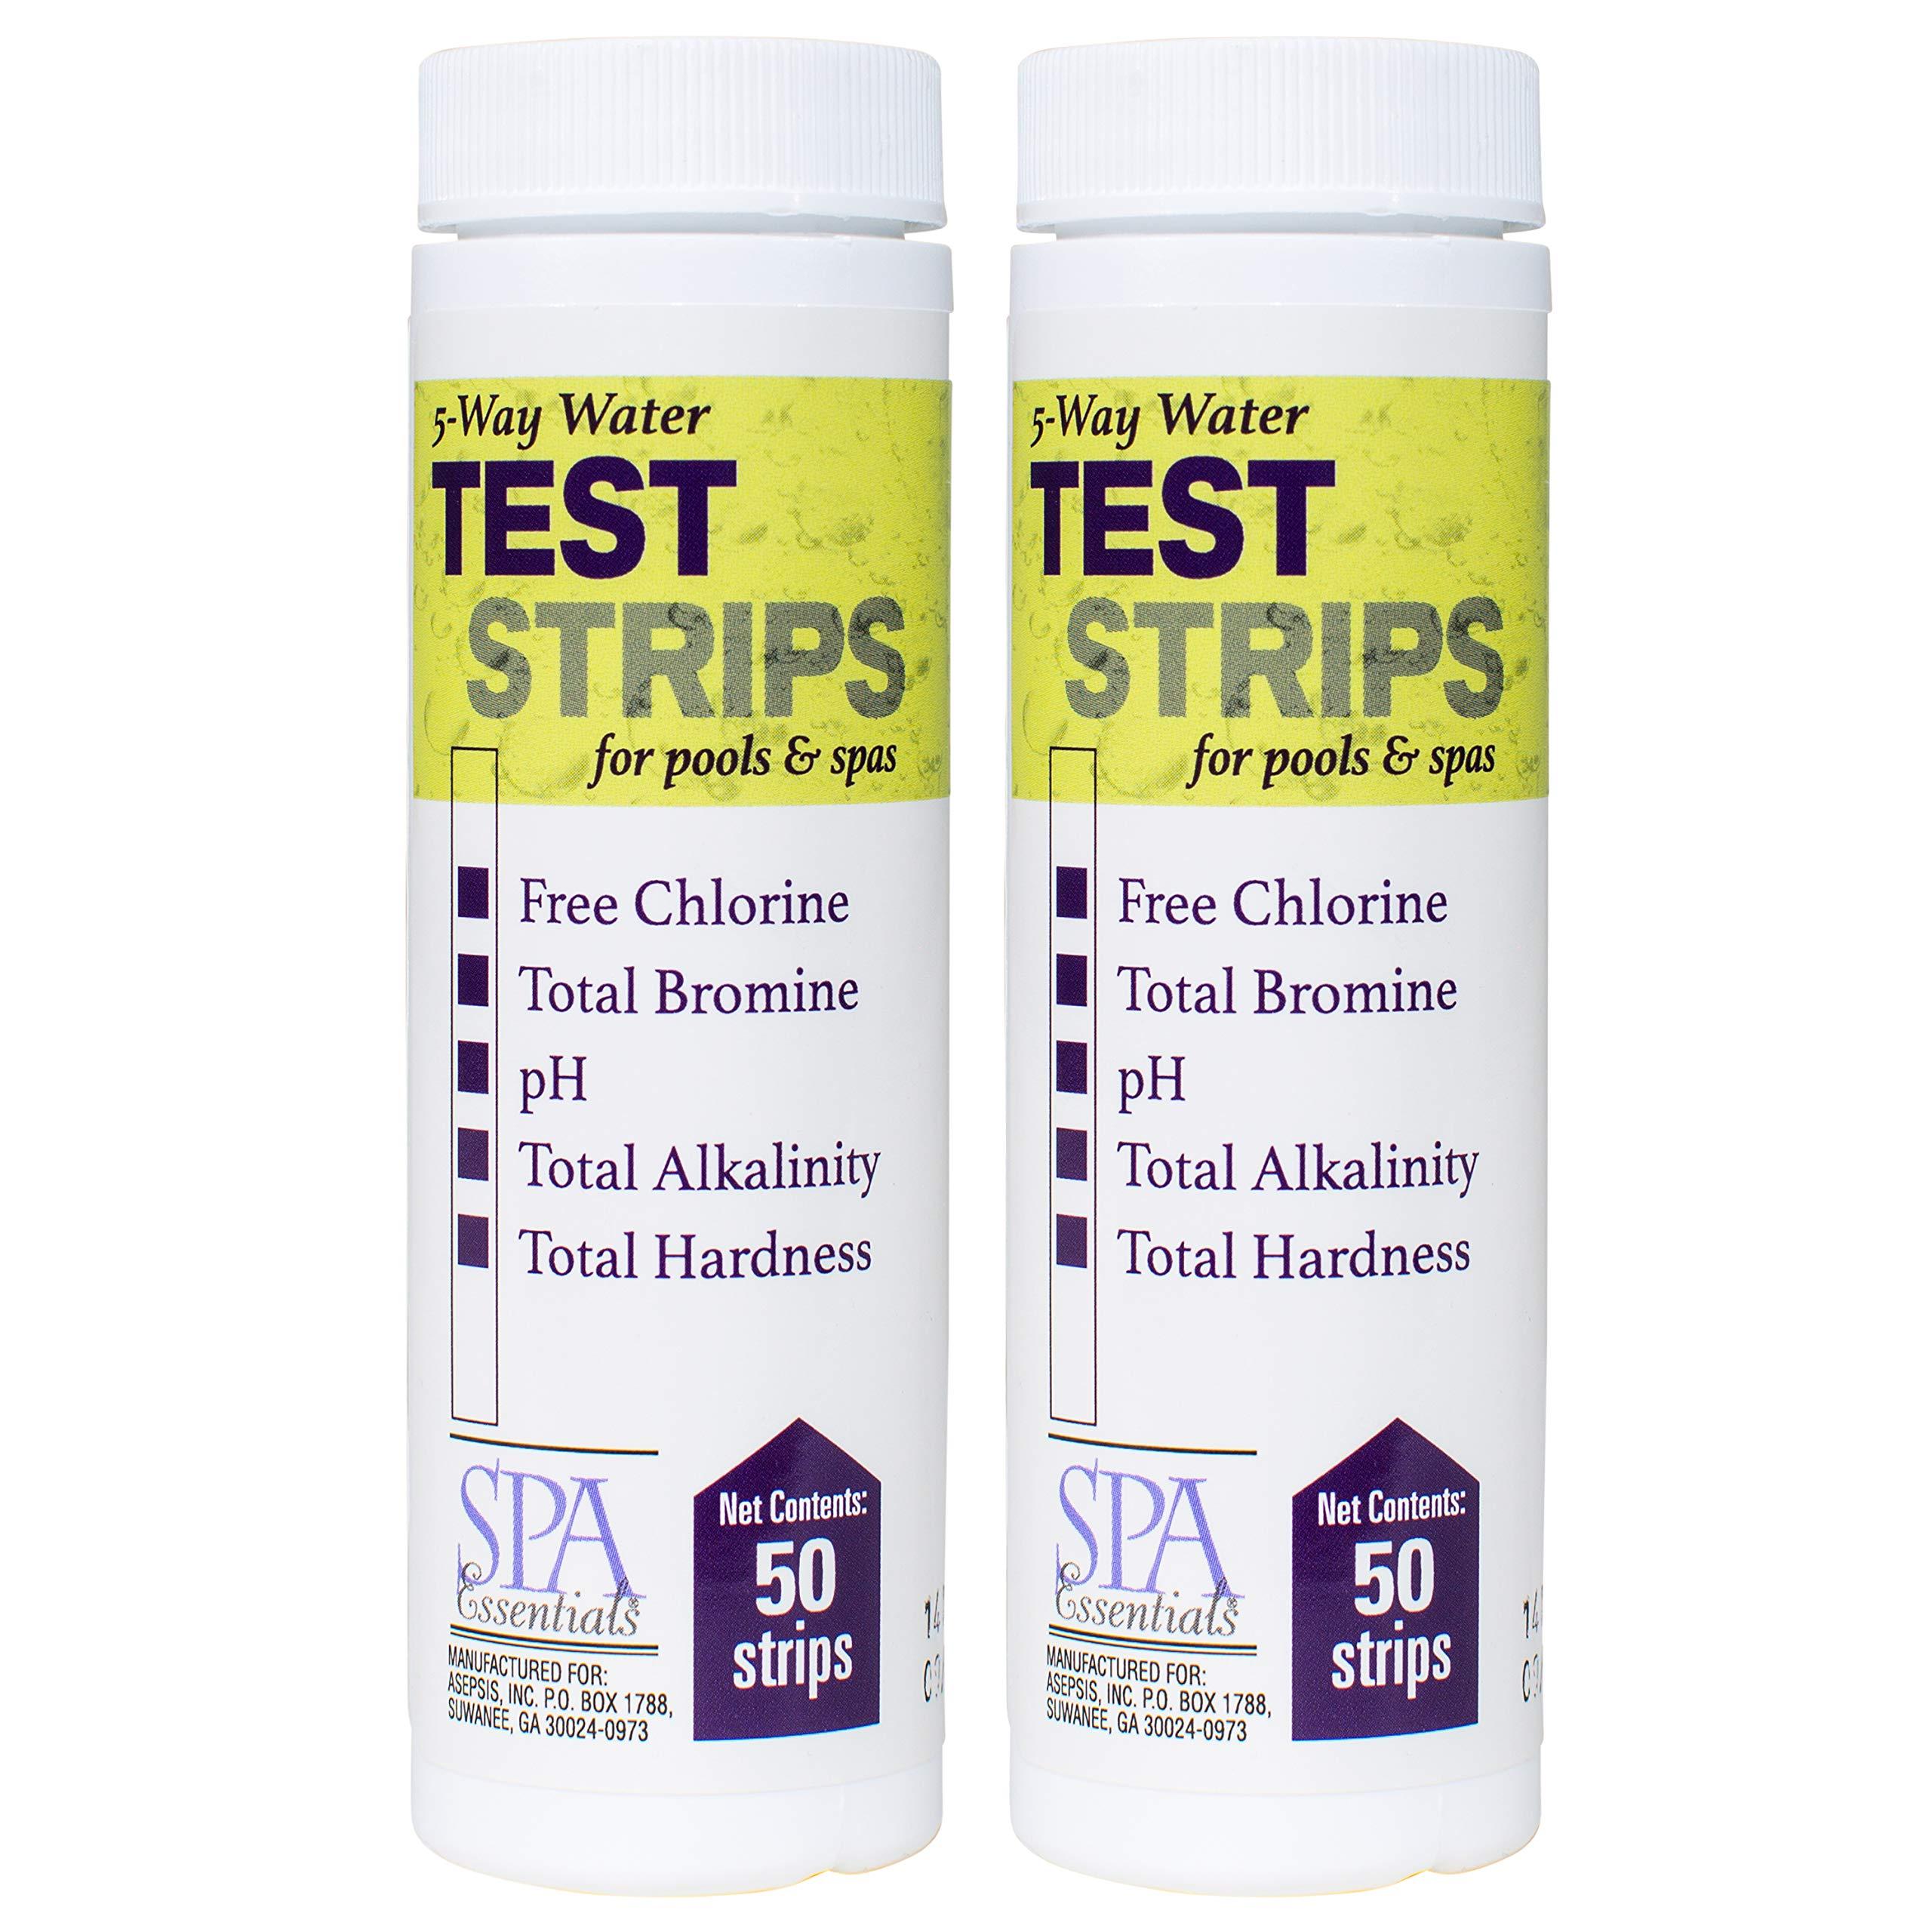 Spa Essentials 5-Way Water Test Strips (2 Pack) by Spa Essentials